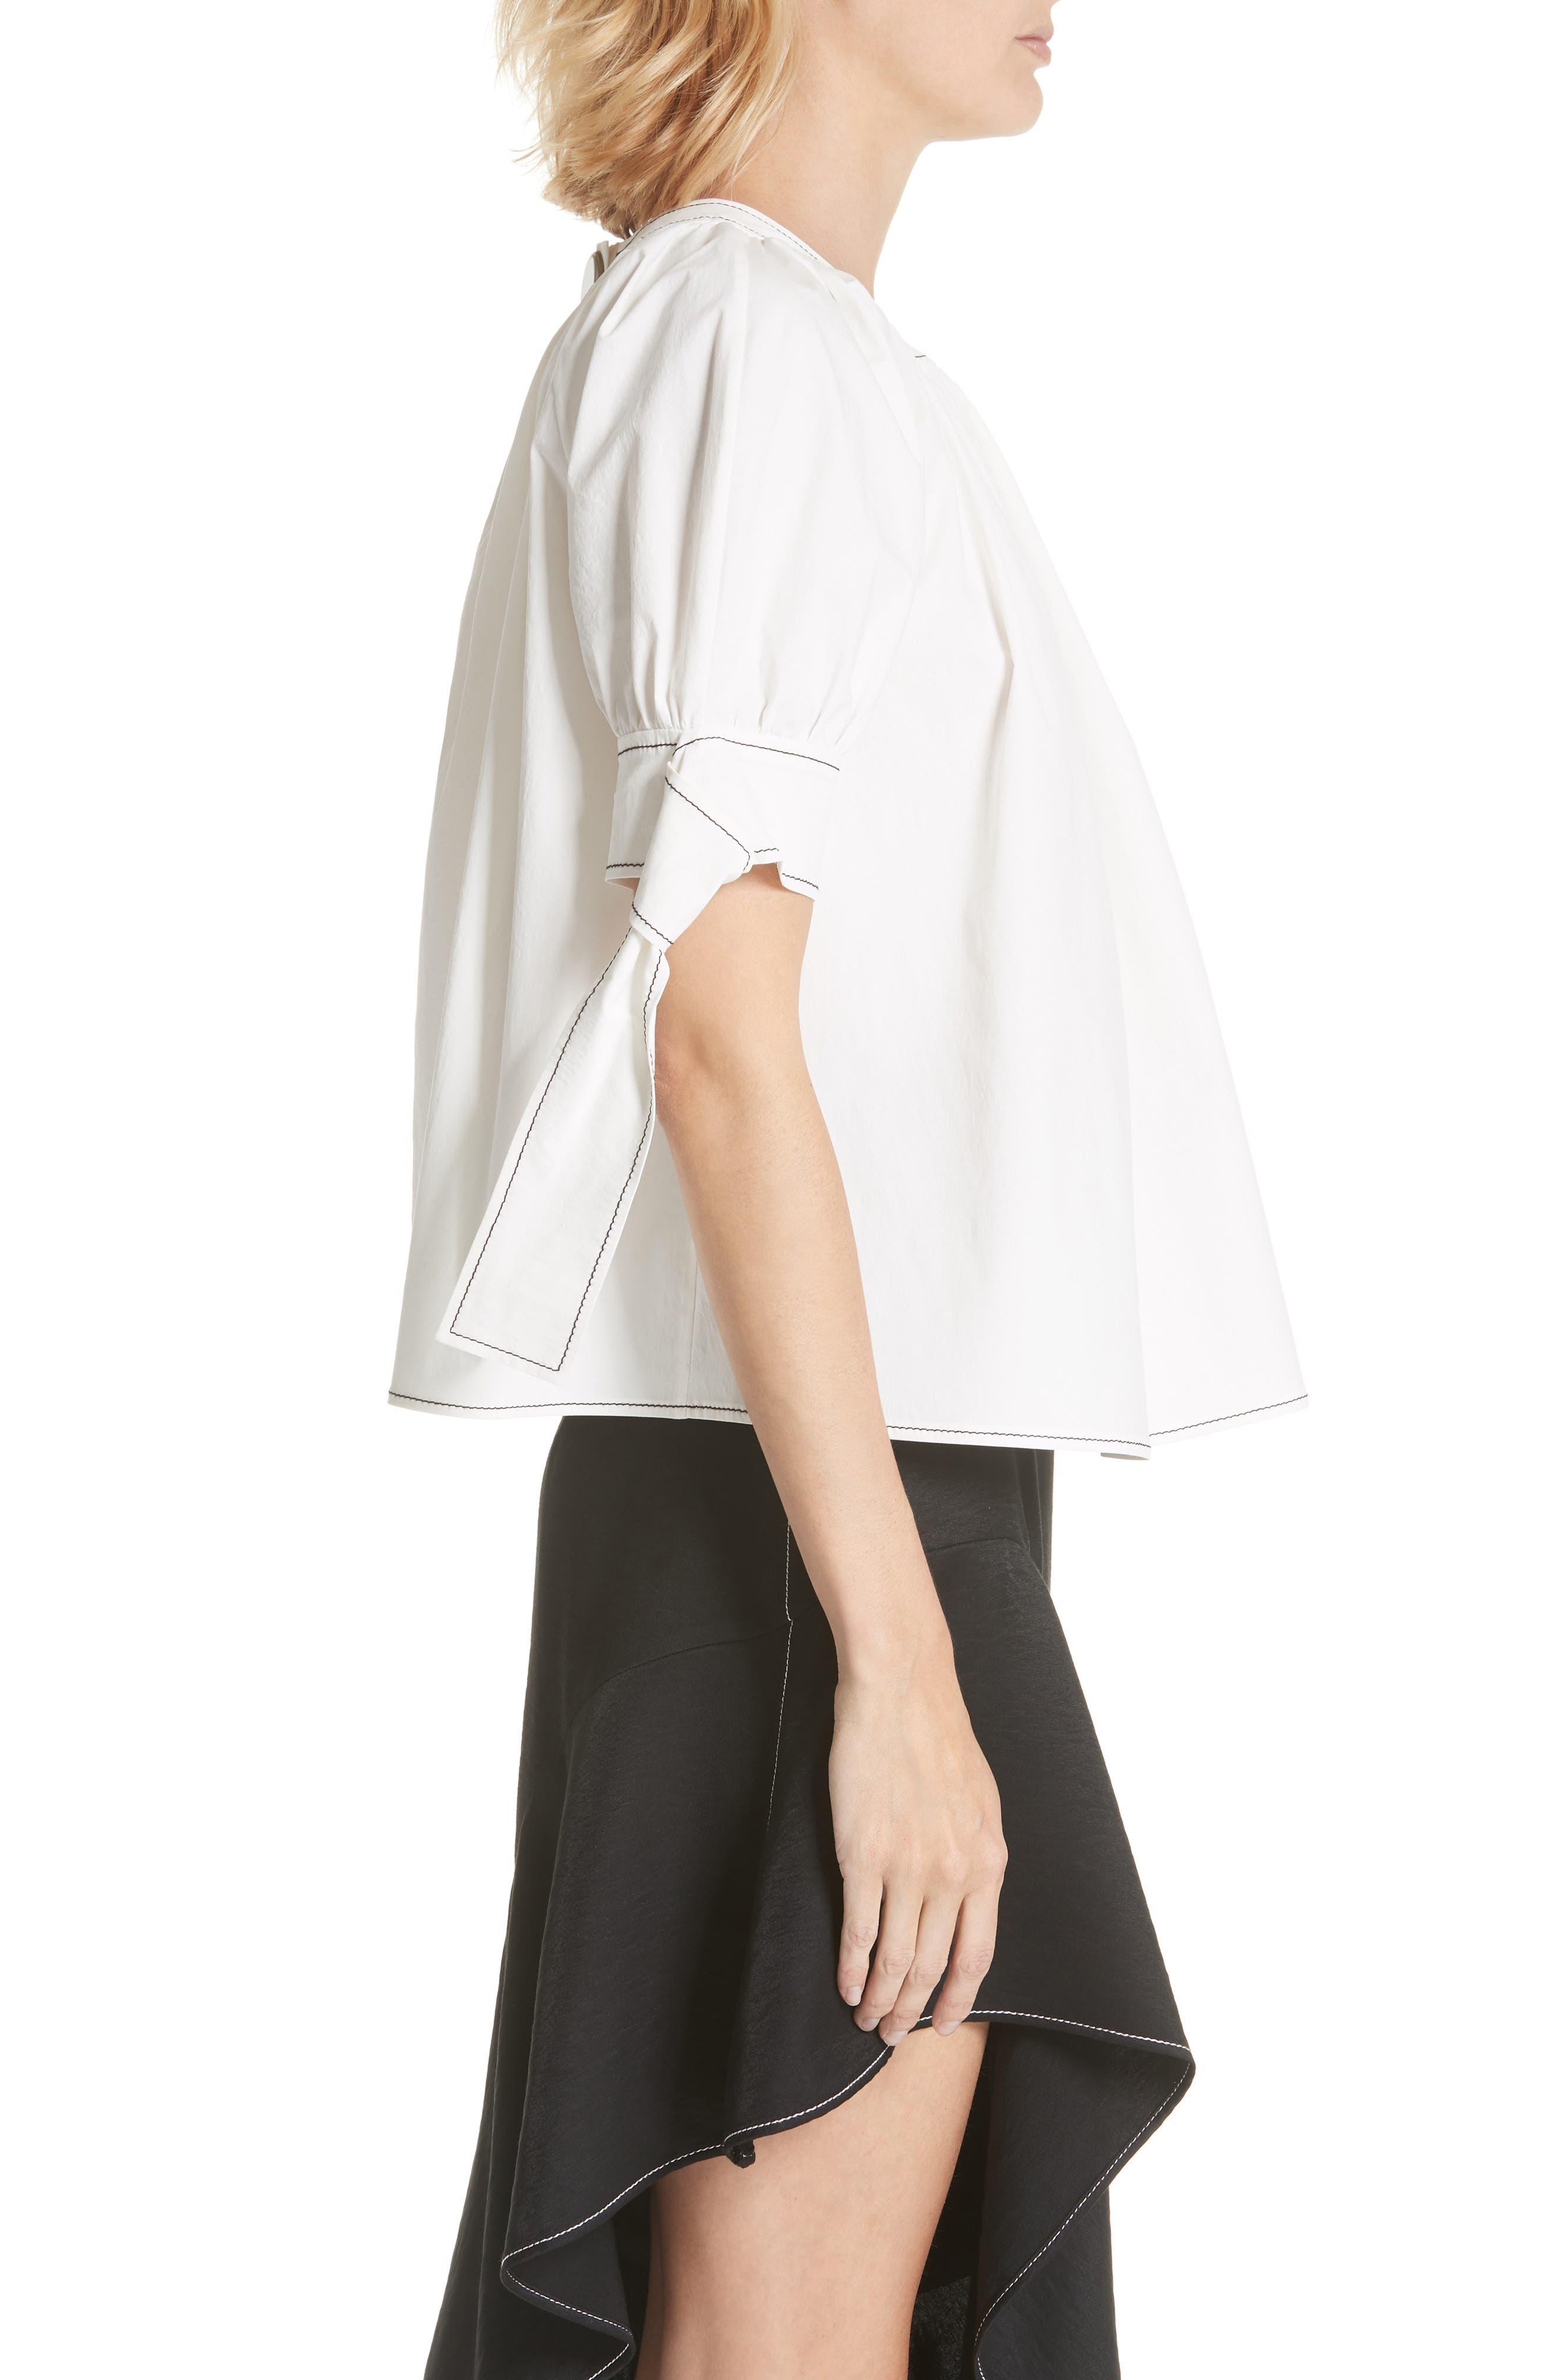 Hailey Short Sleeve Blouse Top,                             Alternate thumbnail 3, color,                             Cotton White